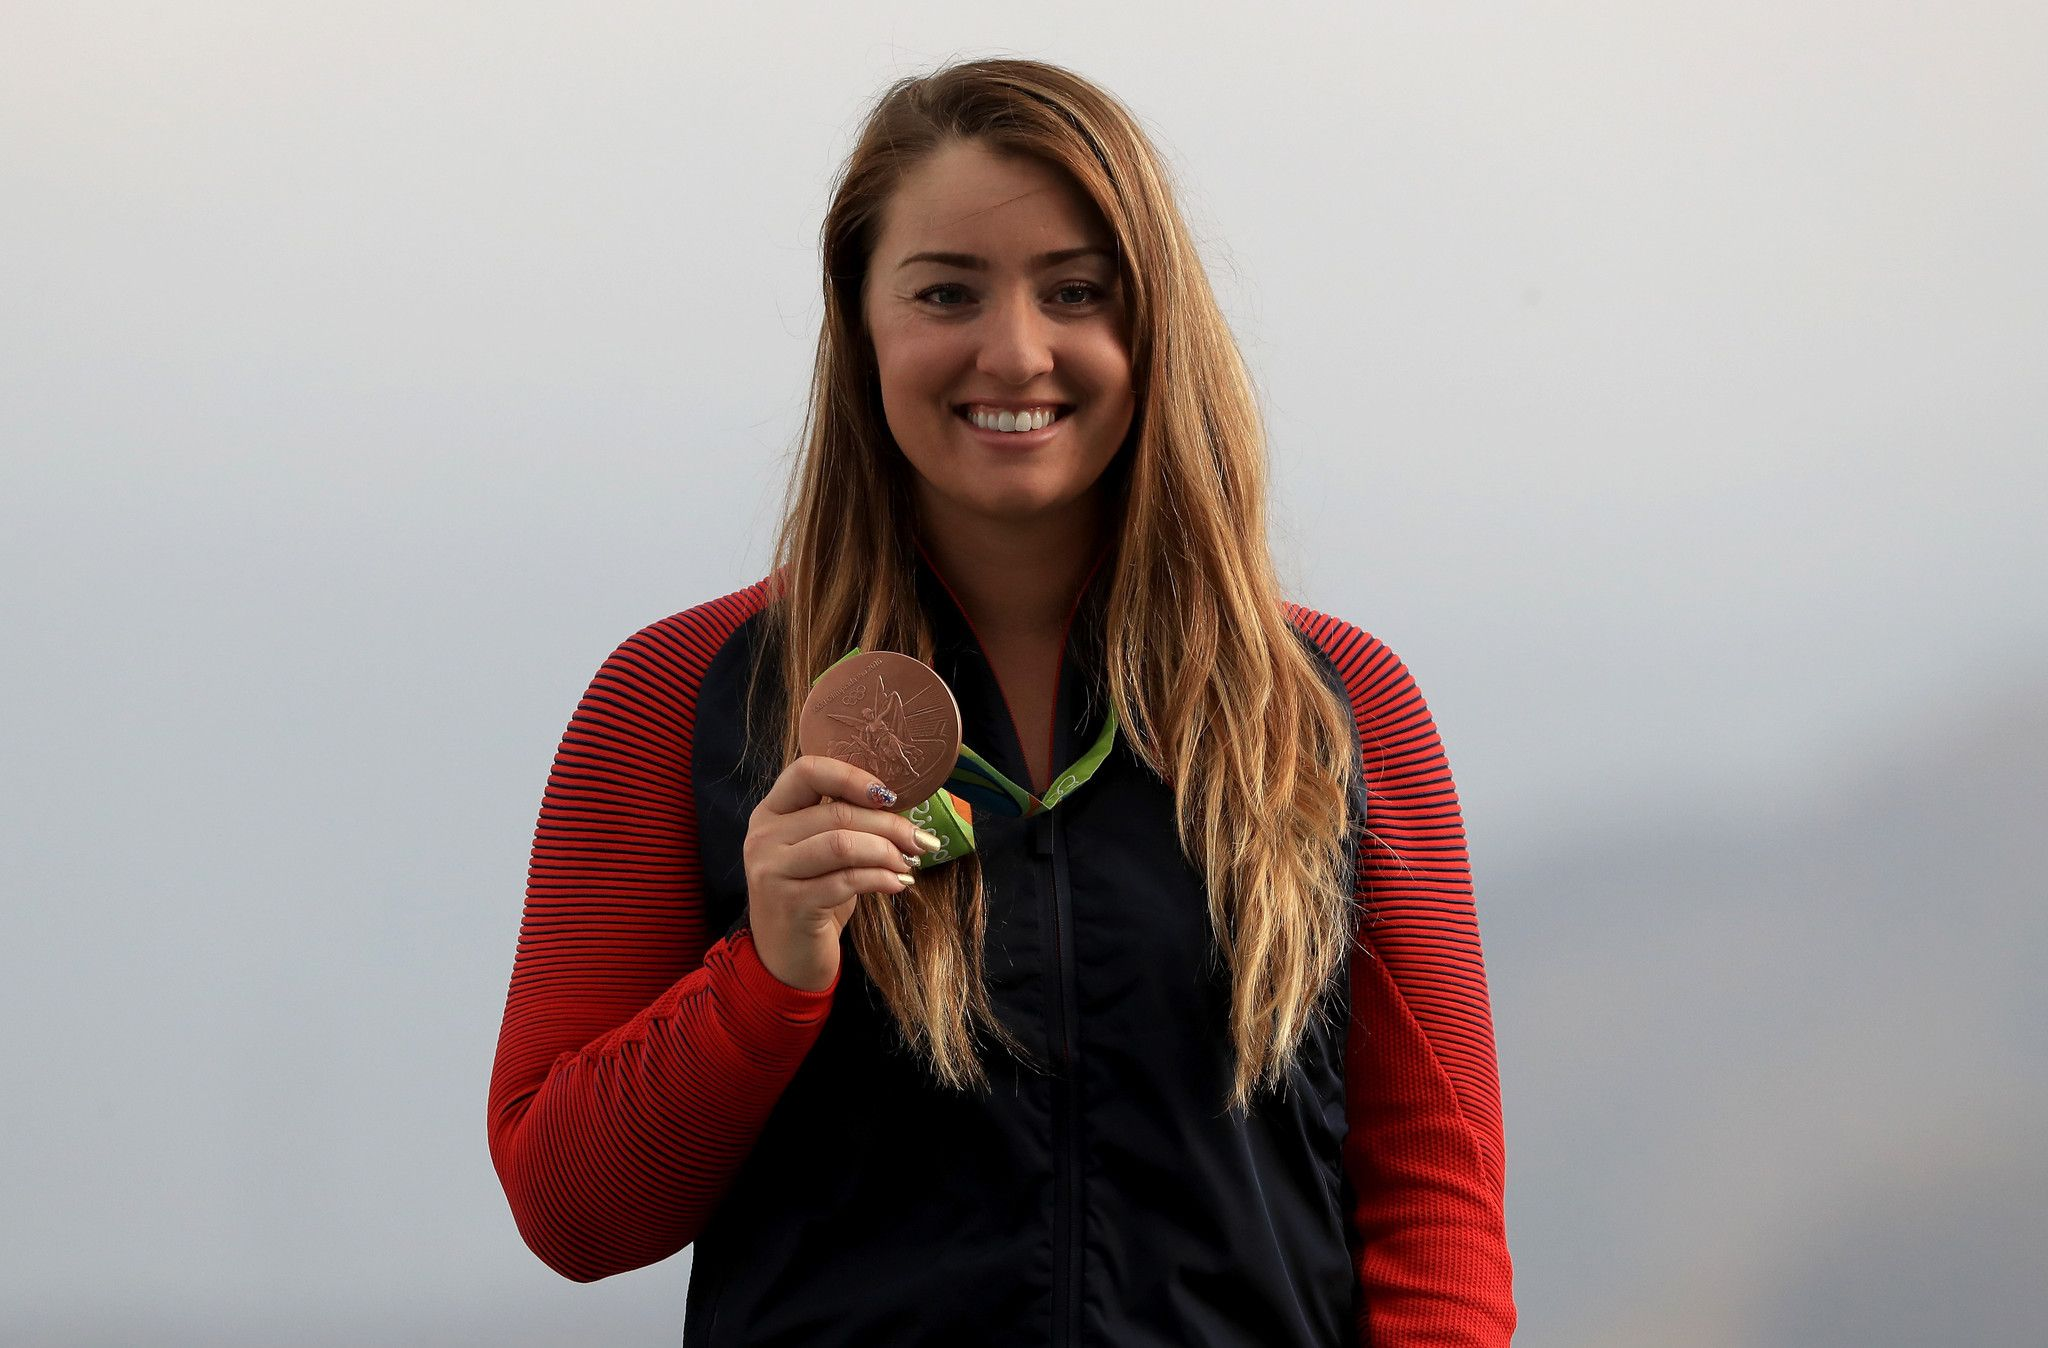 Corey Cogdell, wife of Bears lineman Mitch Unrein, wins bronze in Rio